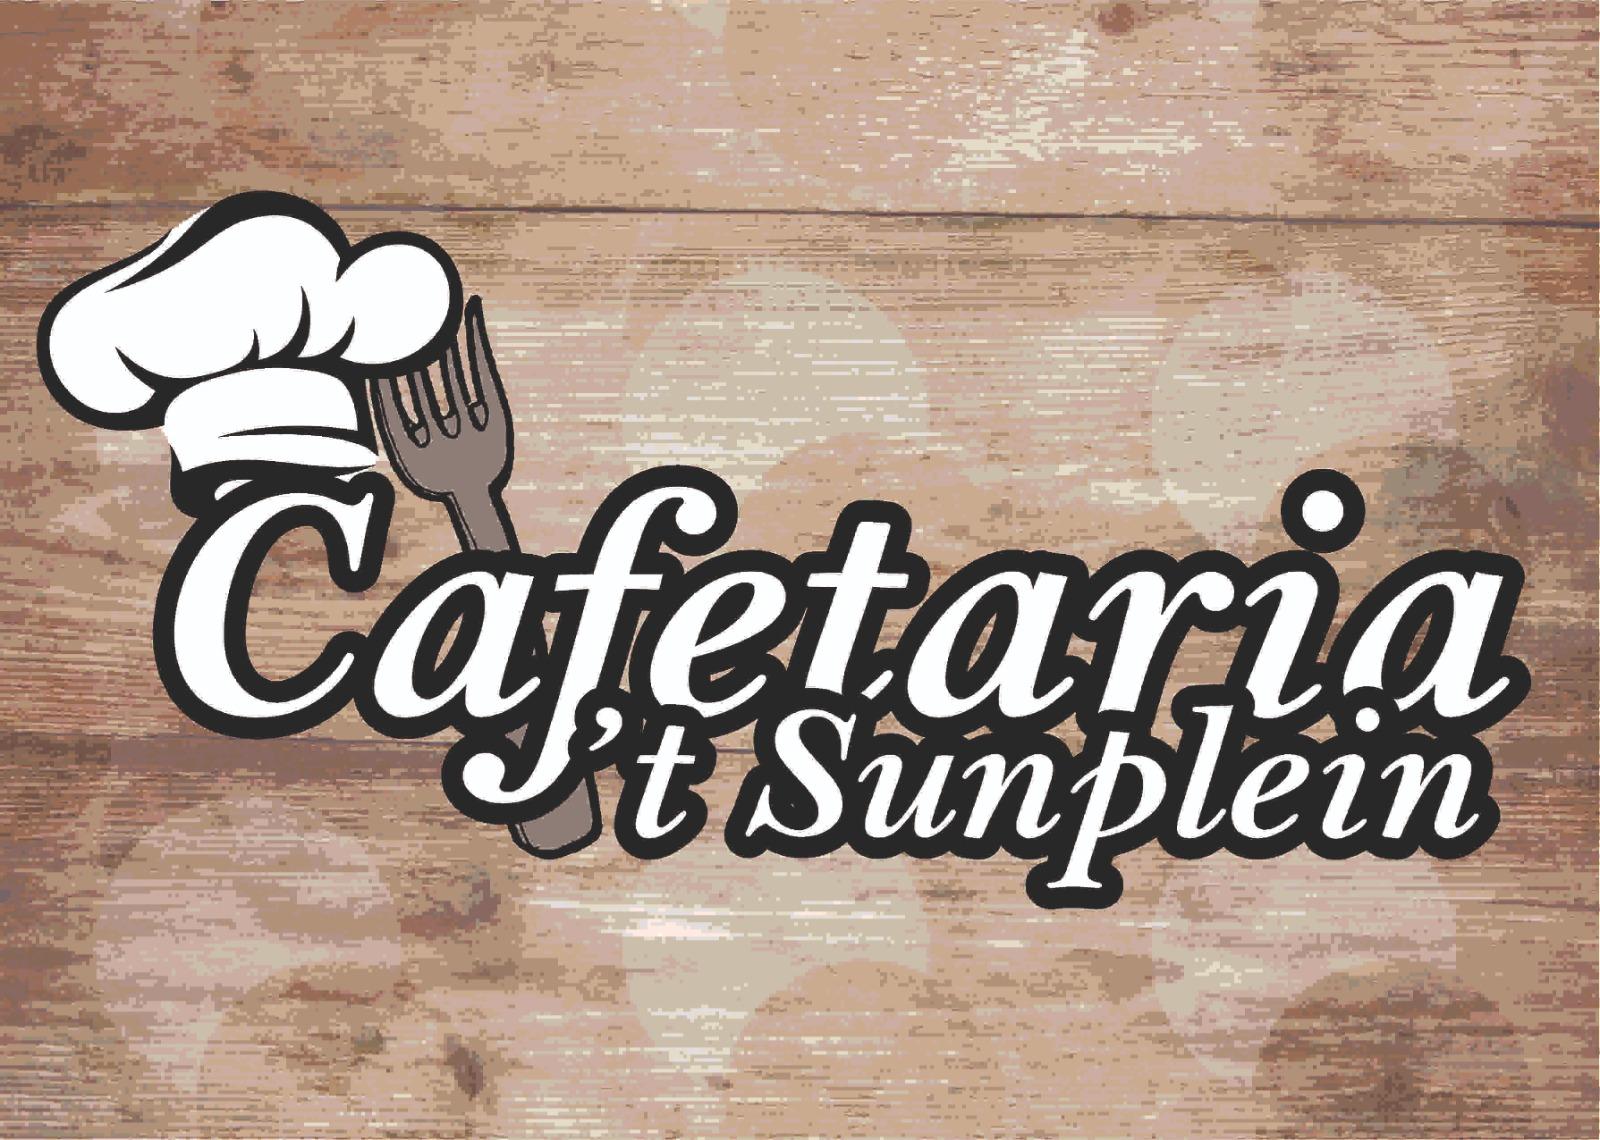 Impressie van ons Cafetaria 't Sunplein